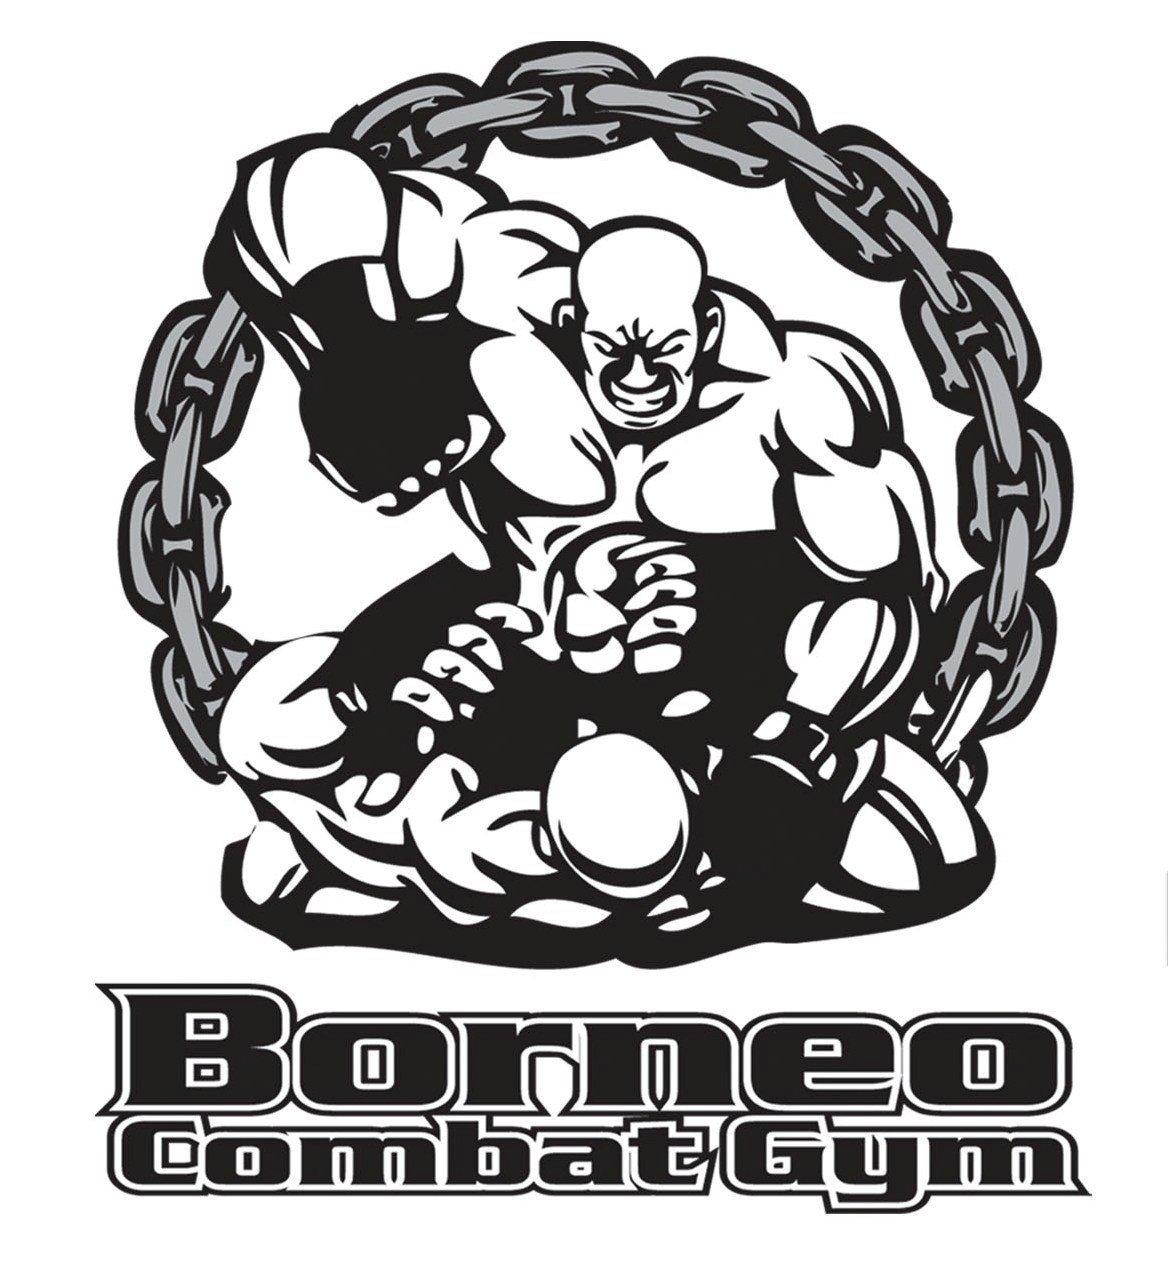 Borneo Combat Gym logo